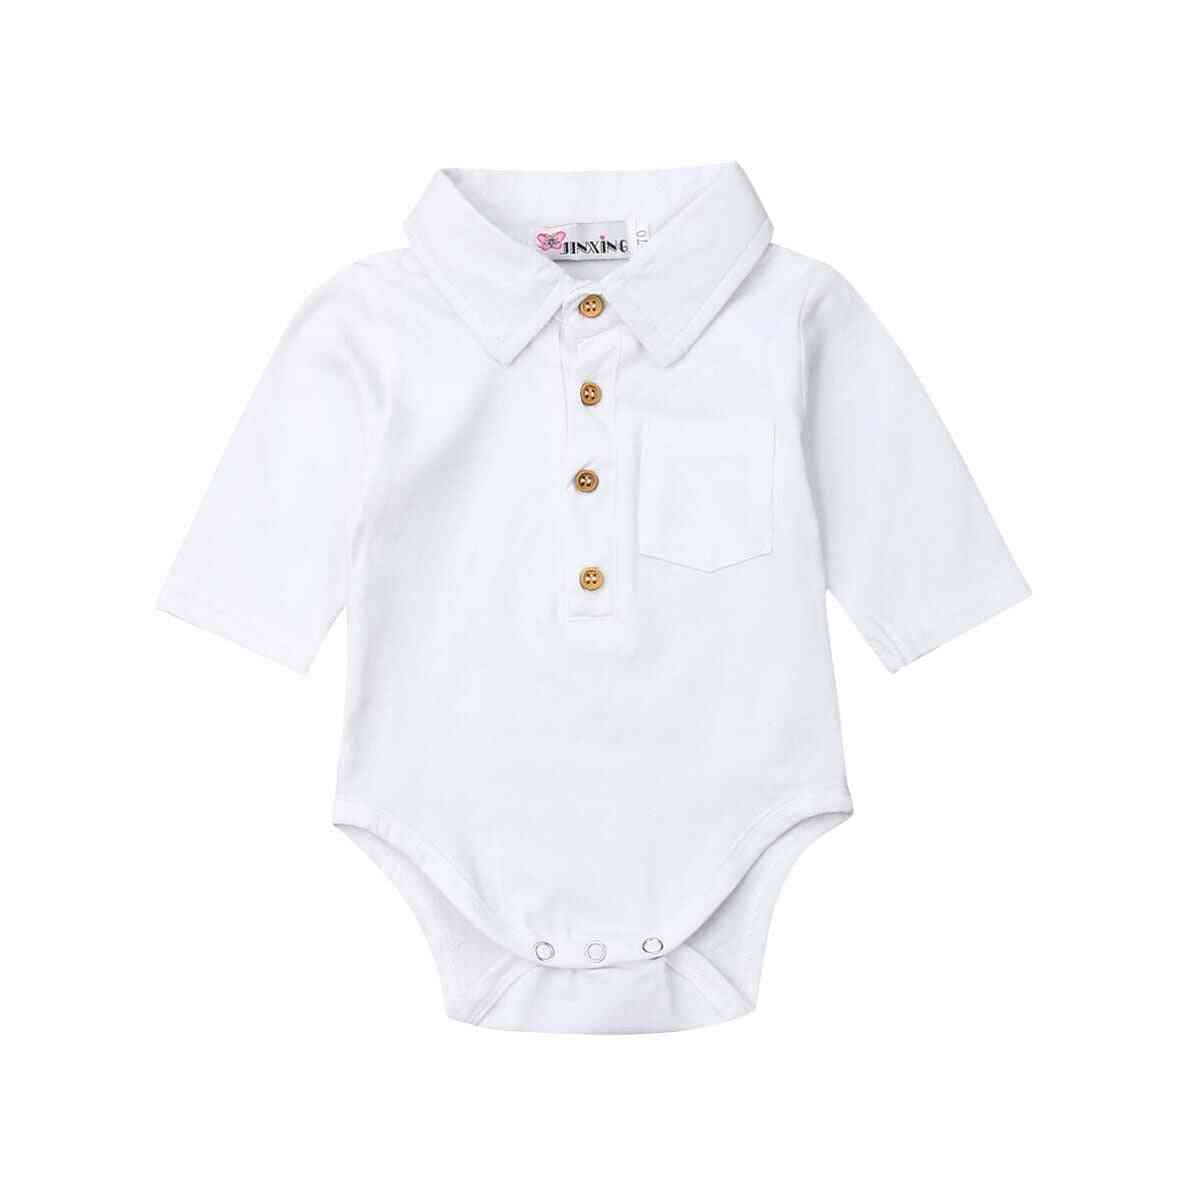 Baby Summer Clothing Formal Bodysuit - Short Sleeve Turn Down Collar Shirts